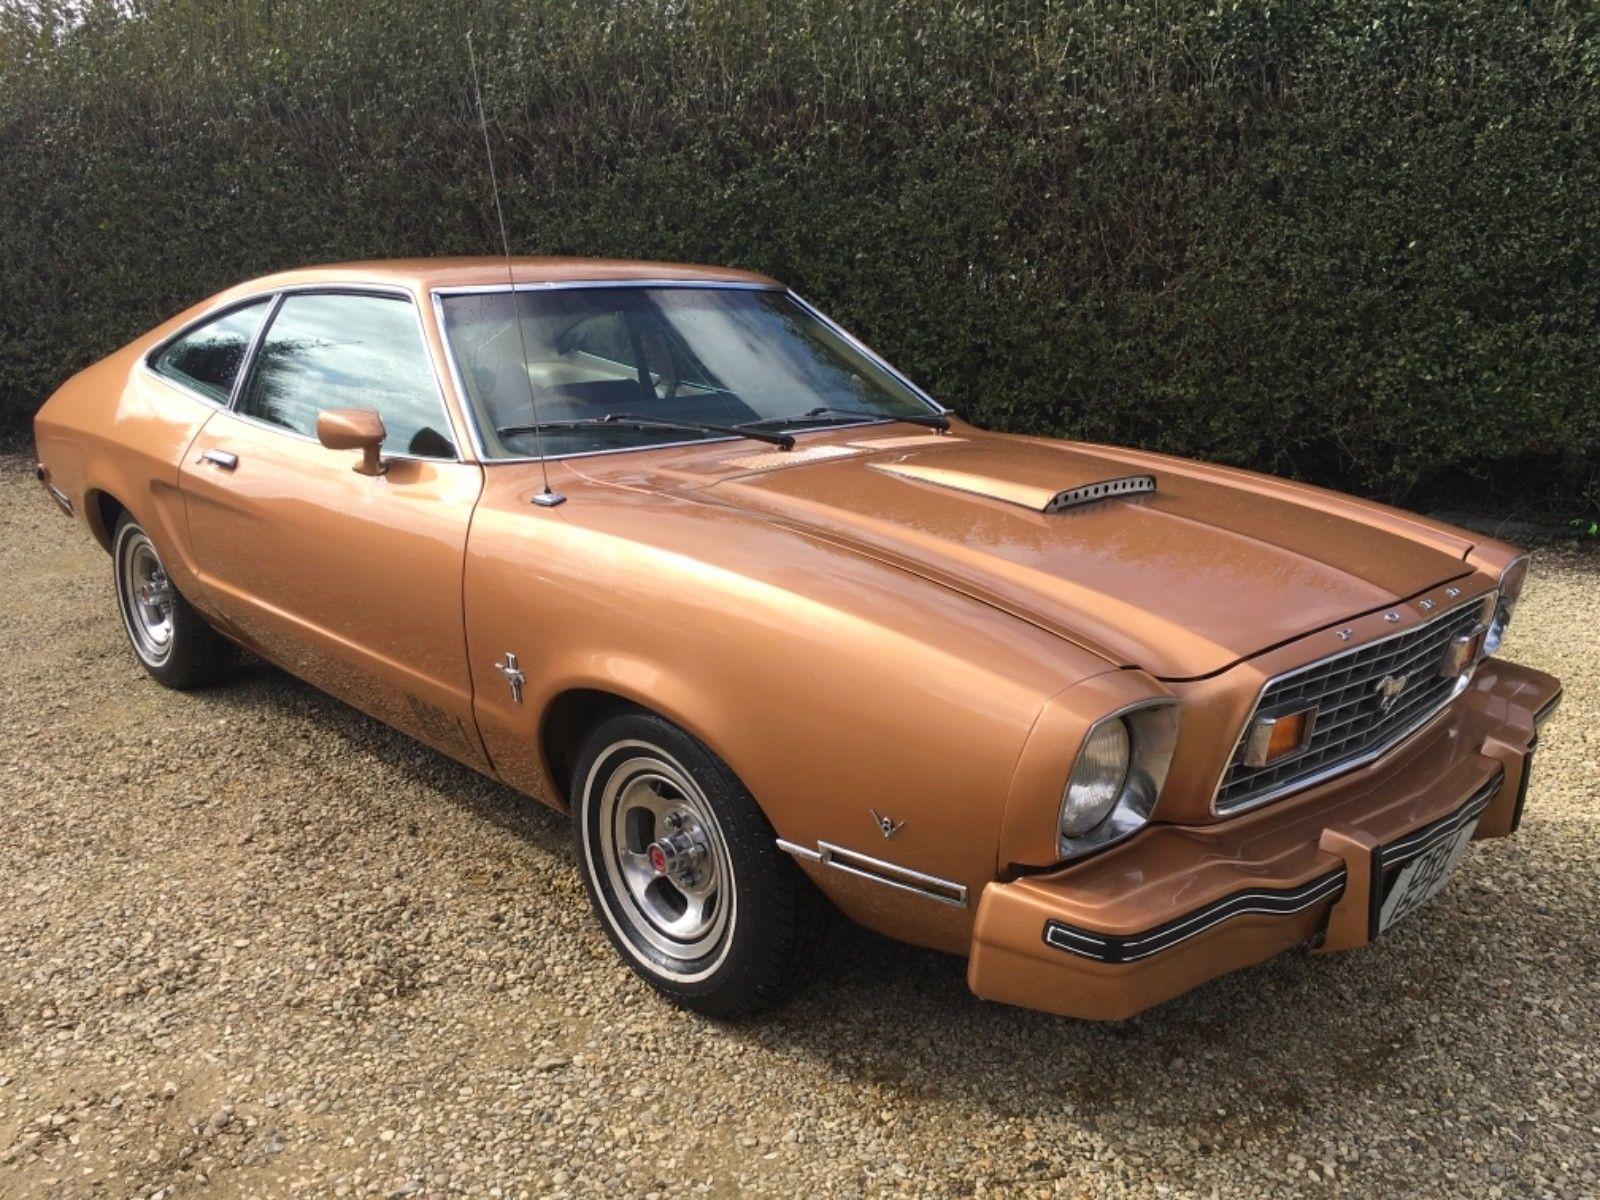 1976 Ford Mustang 11 Mach 1 RHD 302 cu in V8 | Ford mustang, Mustang ...